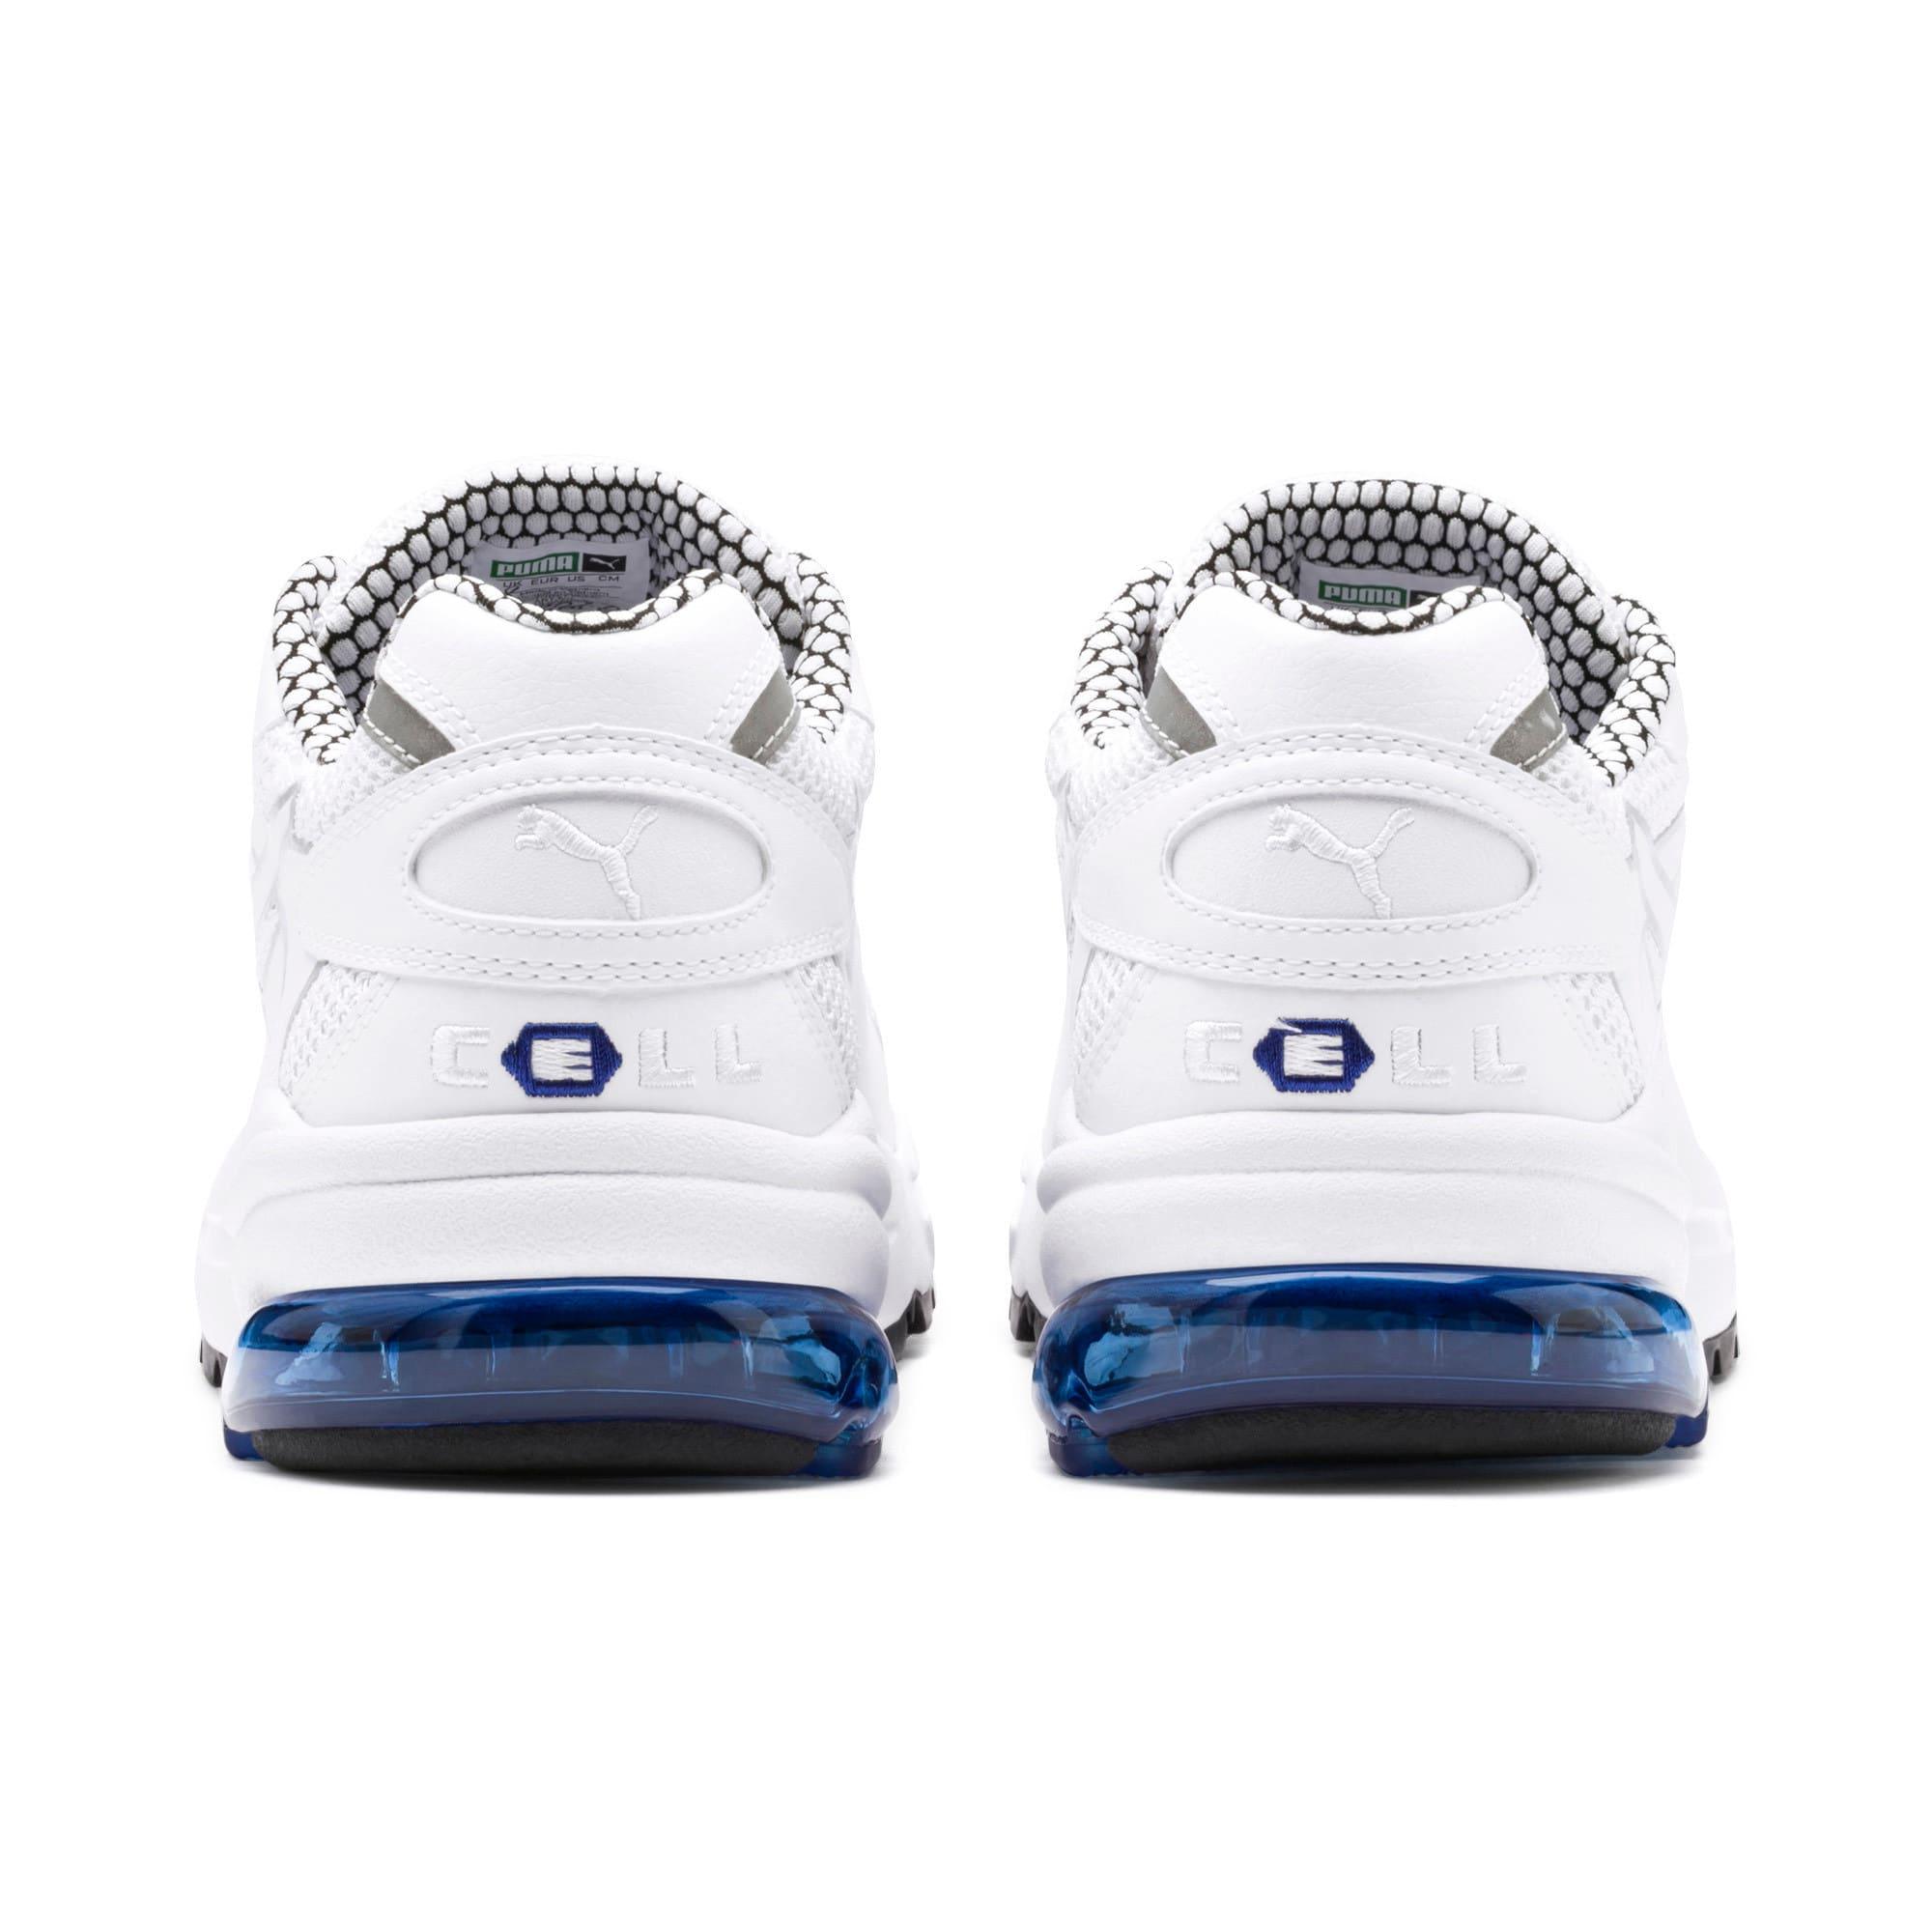 Miniatura 4 de Zapatos deportivos CELL Alien Kotto, Puma White-Puma White, mediano